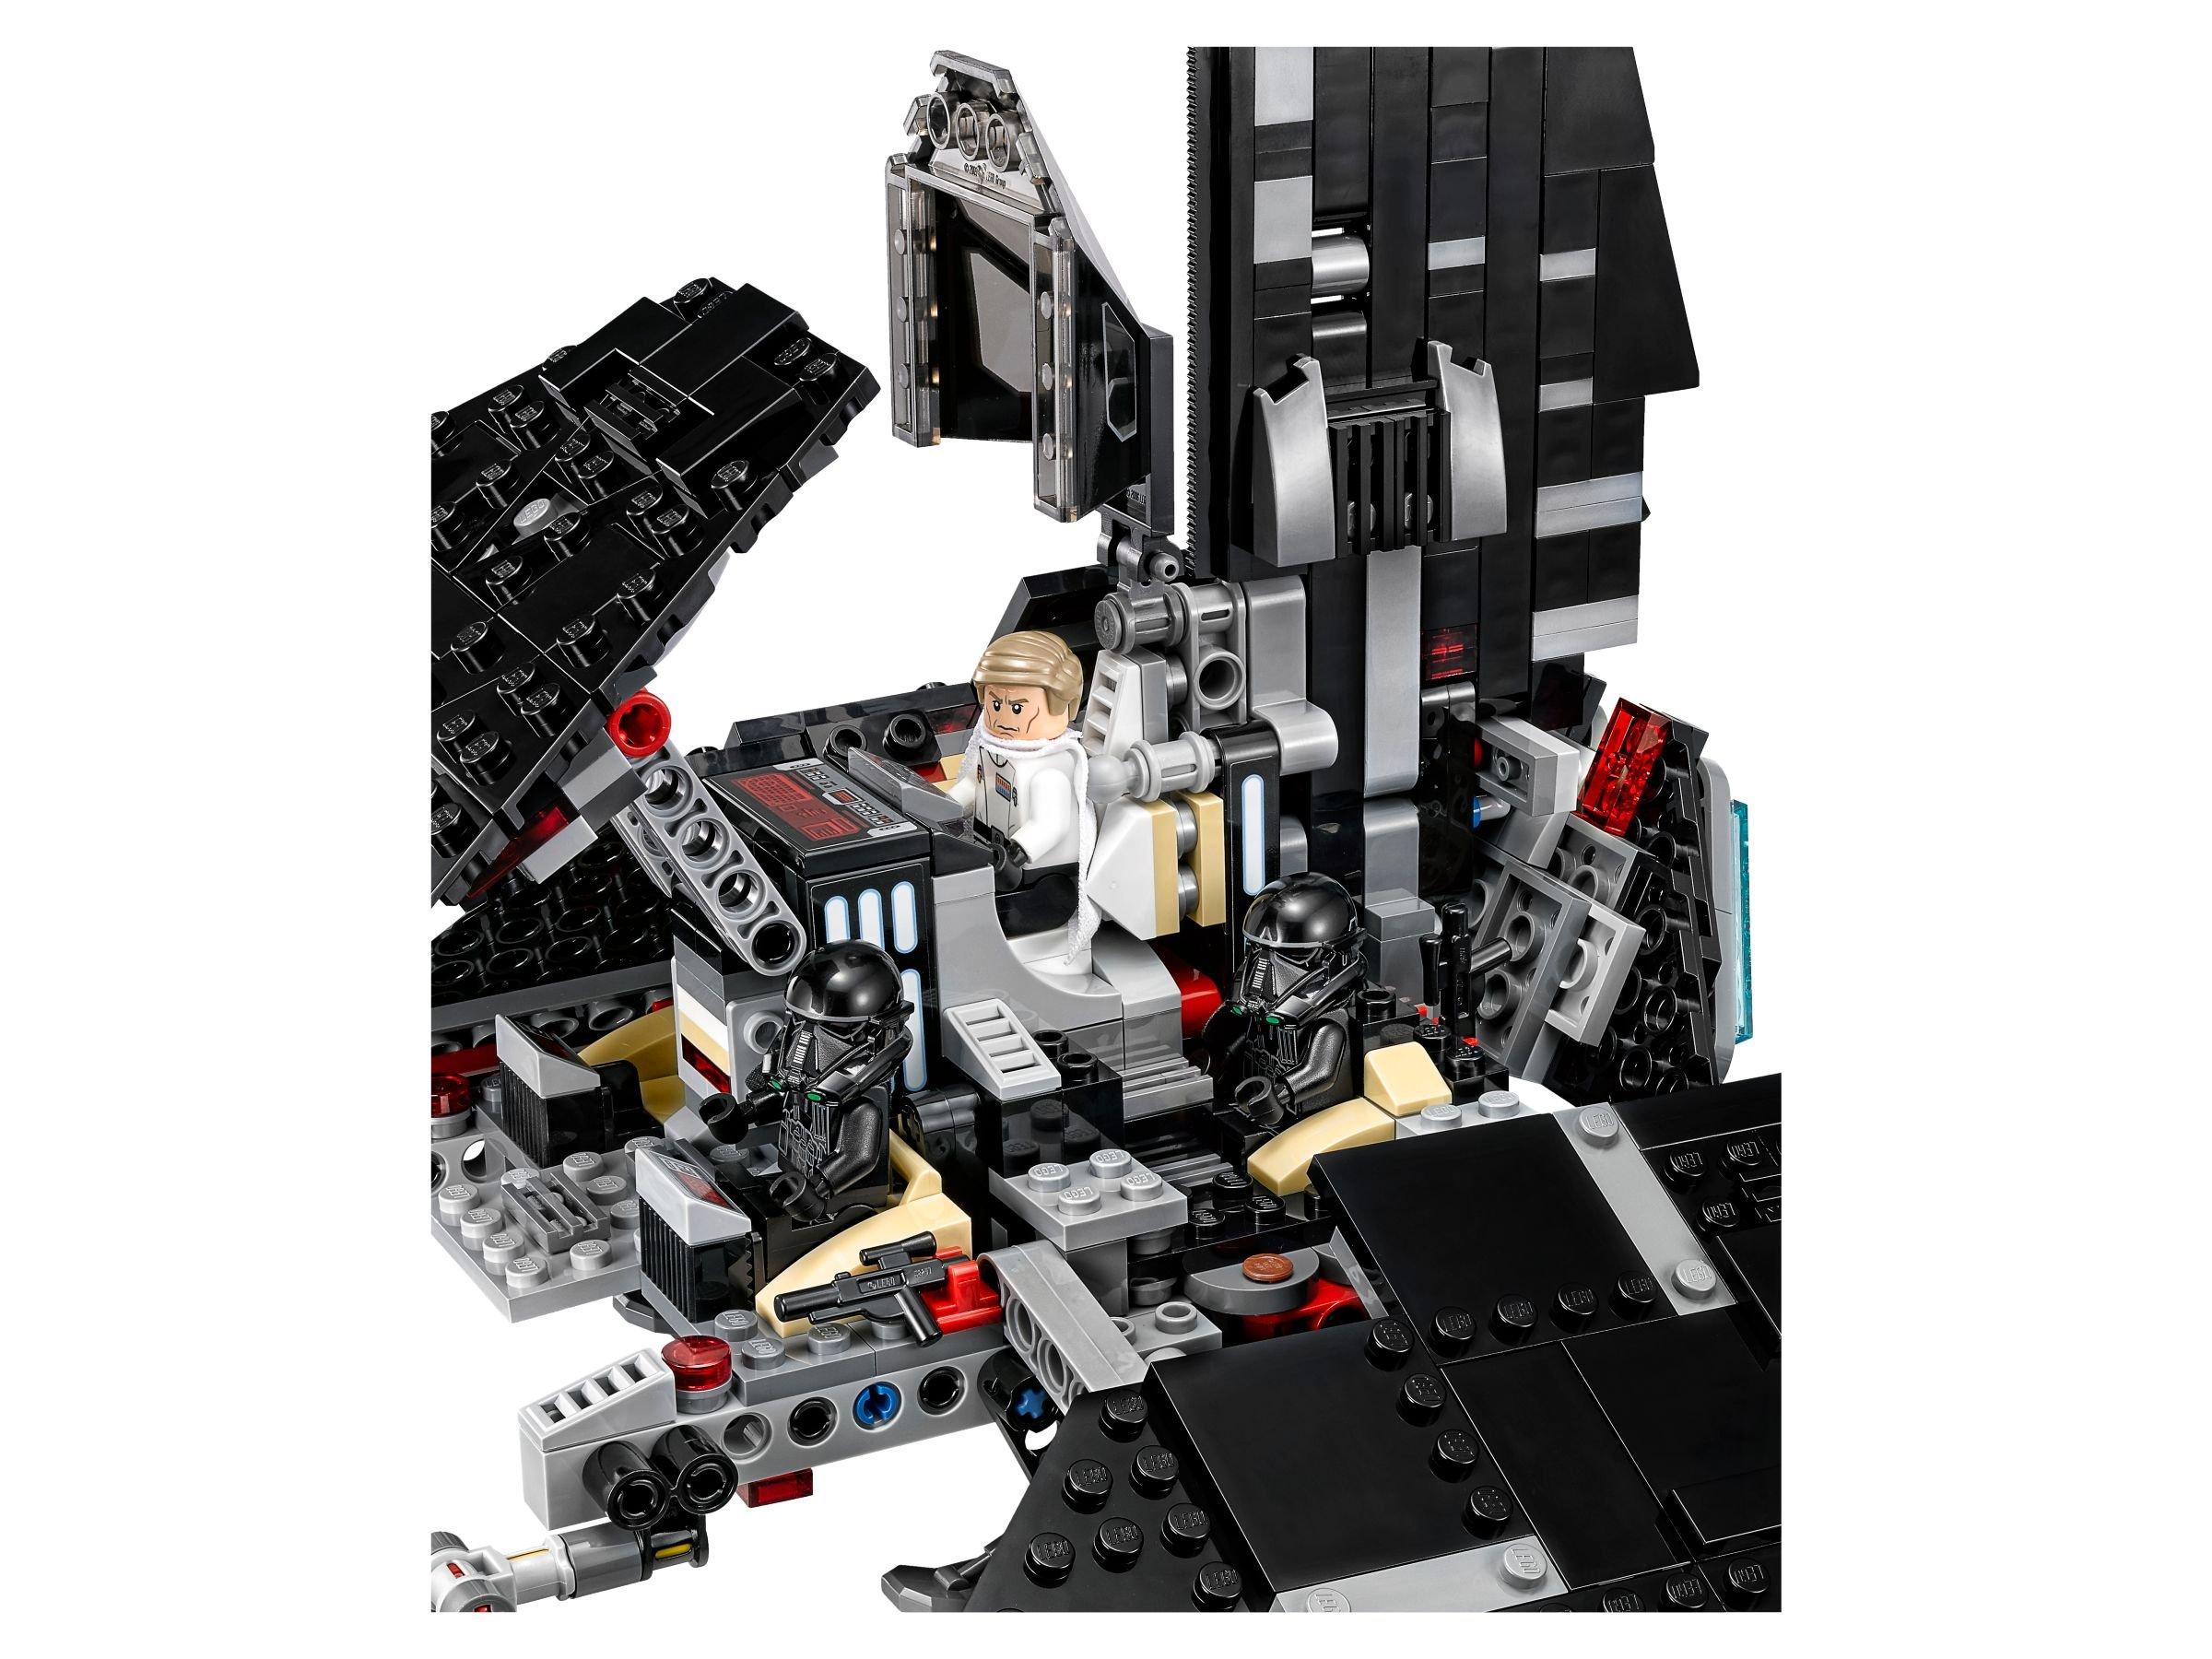 lego 75156 krennics imperial shuttle star wars 2016 ab 89 95 krennic s imperial shuttle. Black Bedroom Furniture Sets. Home Design Ideas